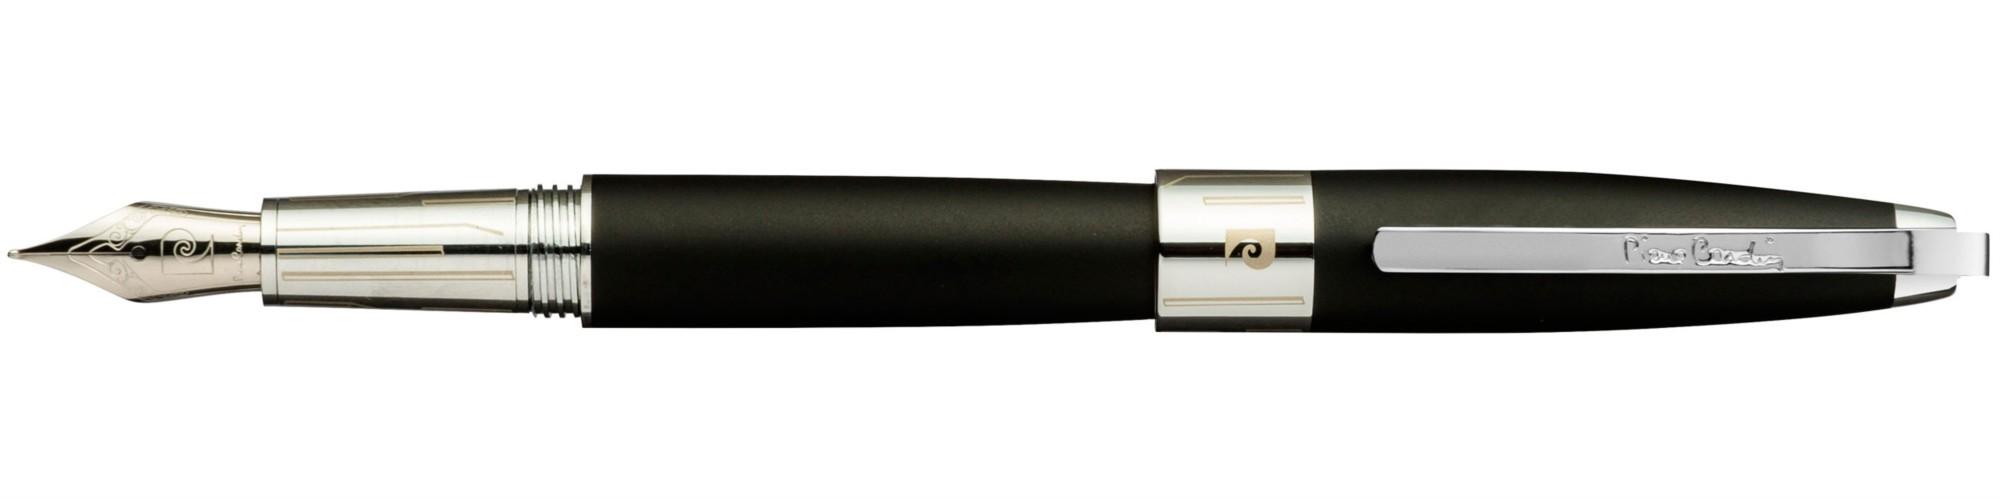 Черная матовая перьевая ручка Pierre Cardin Roi